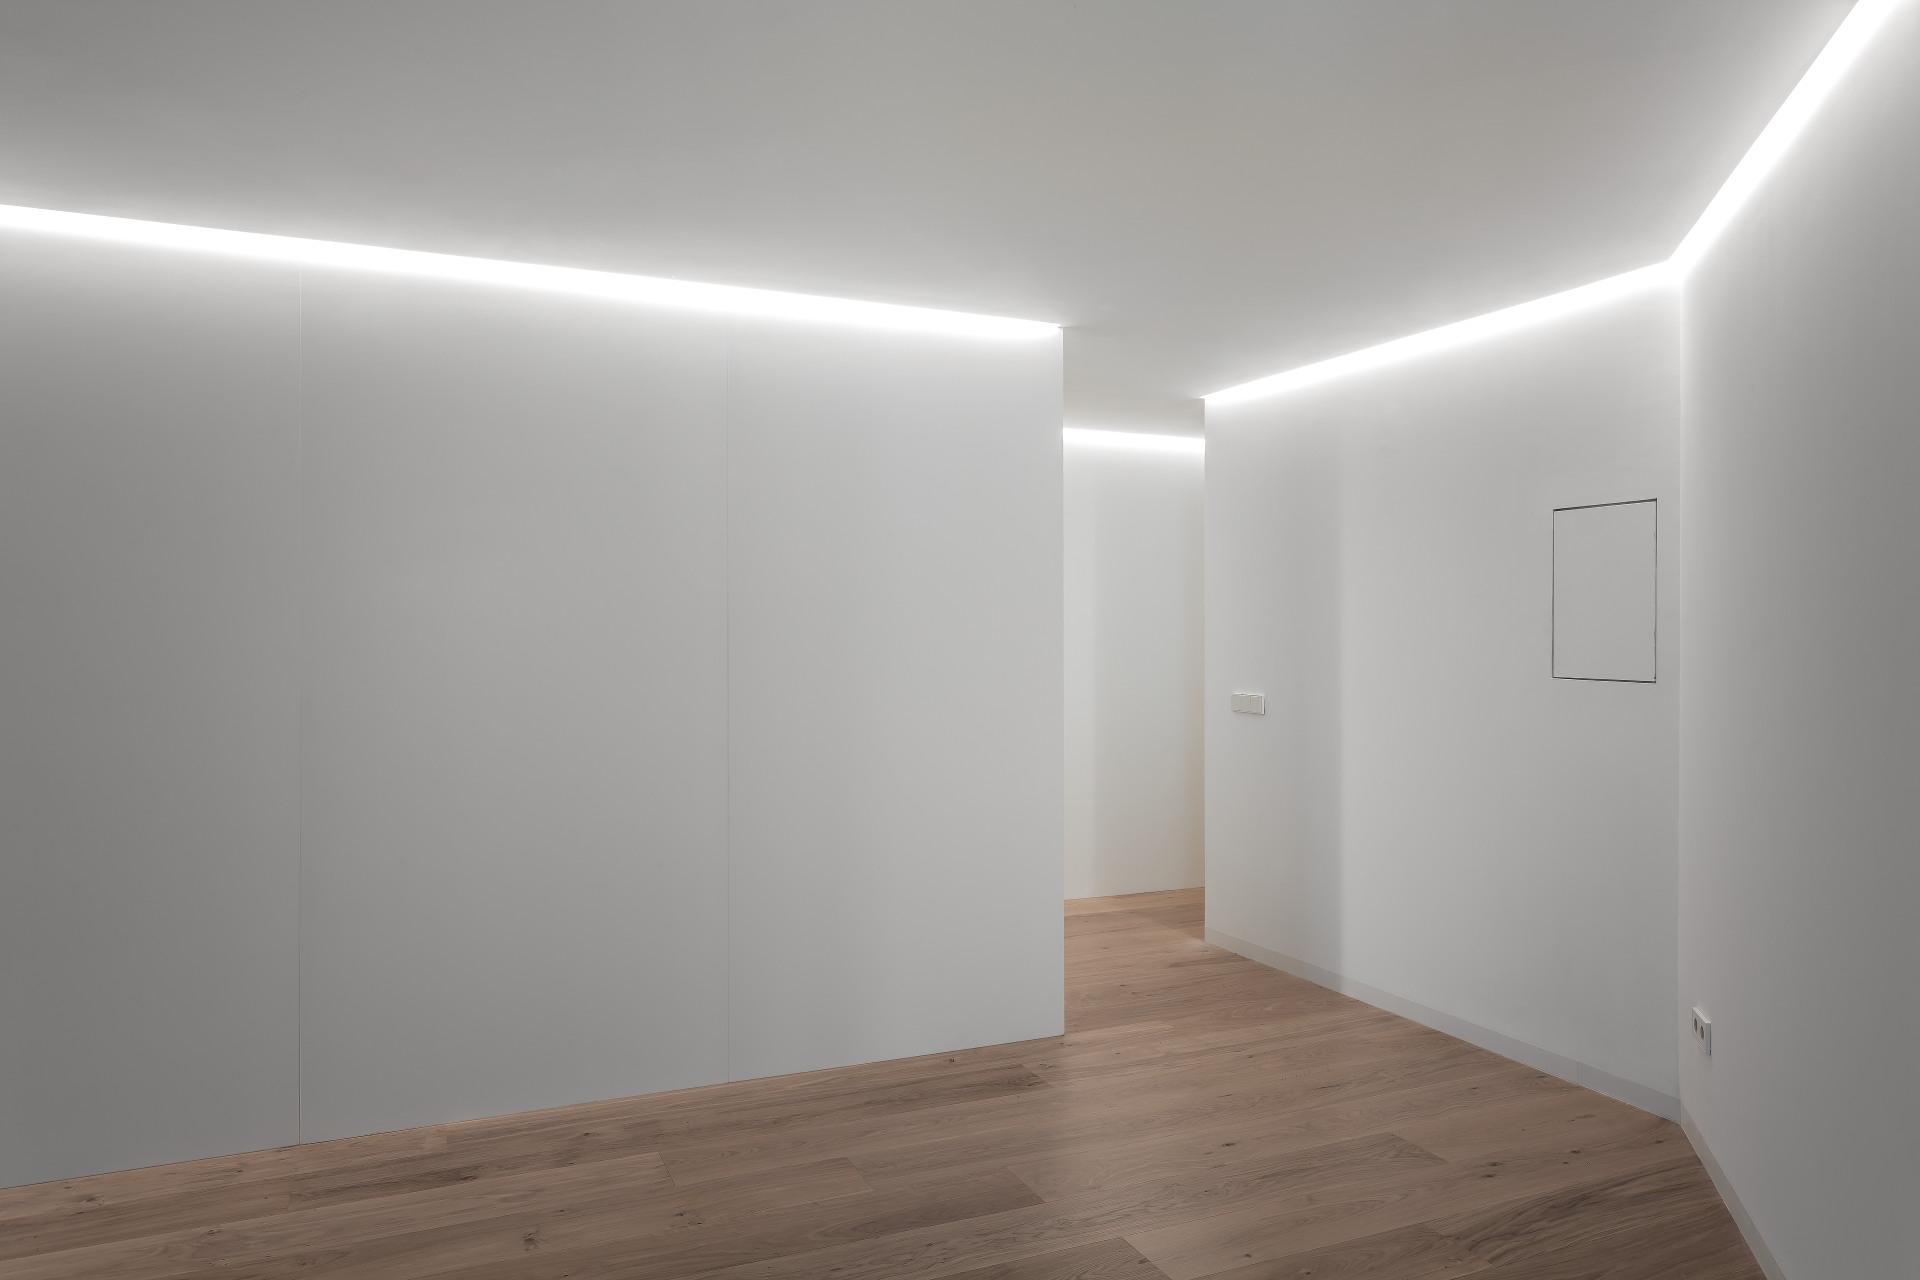 fotografia-arquitectura-interiorismo-valencia-german-cabo-gallardo-llopis-bfm-edificatoria-turia02 (16)